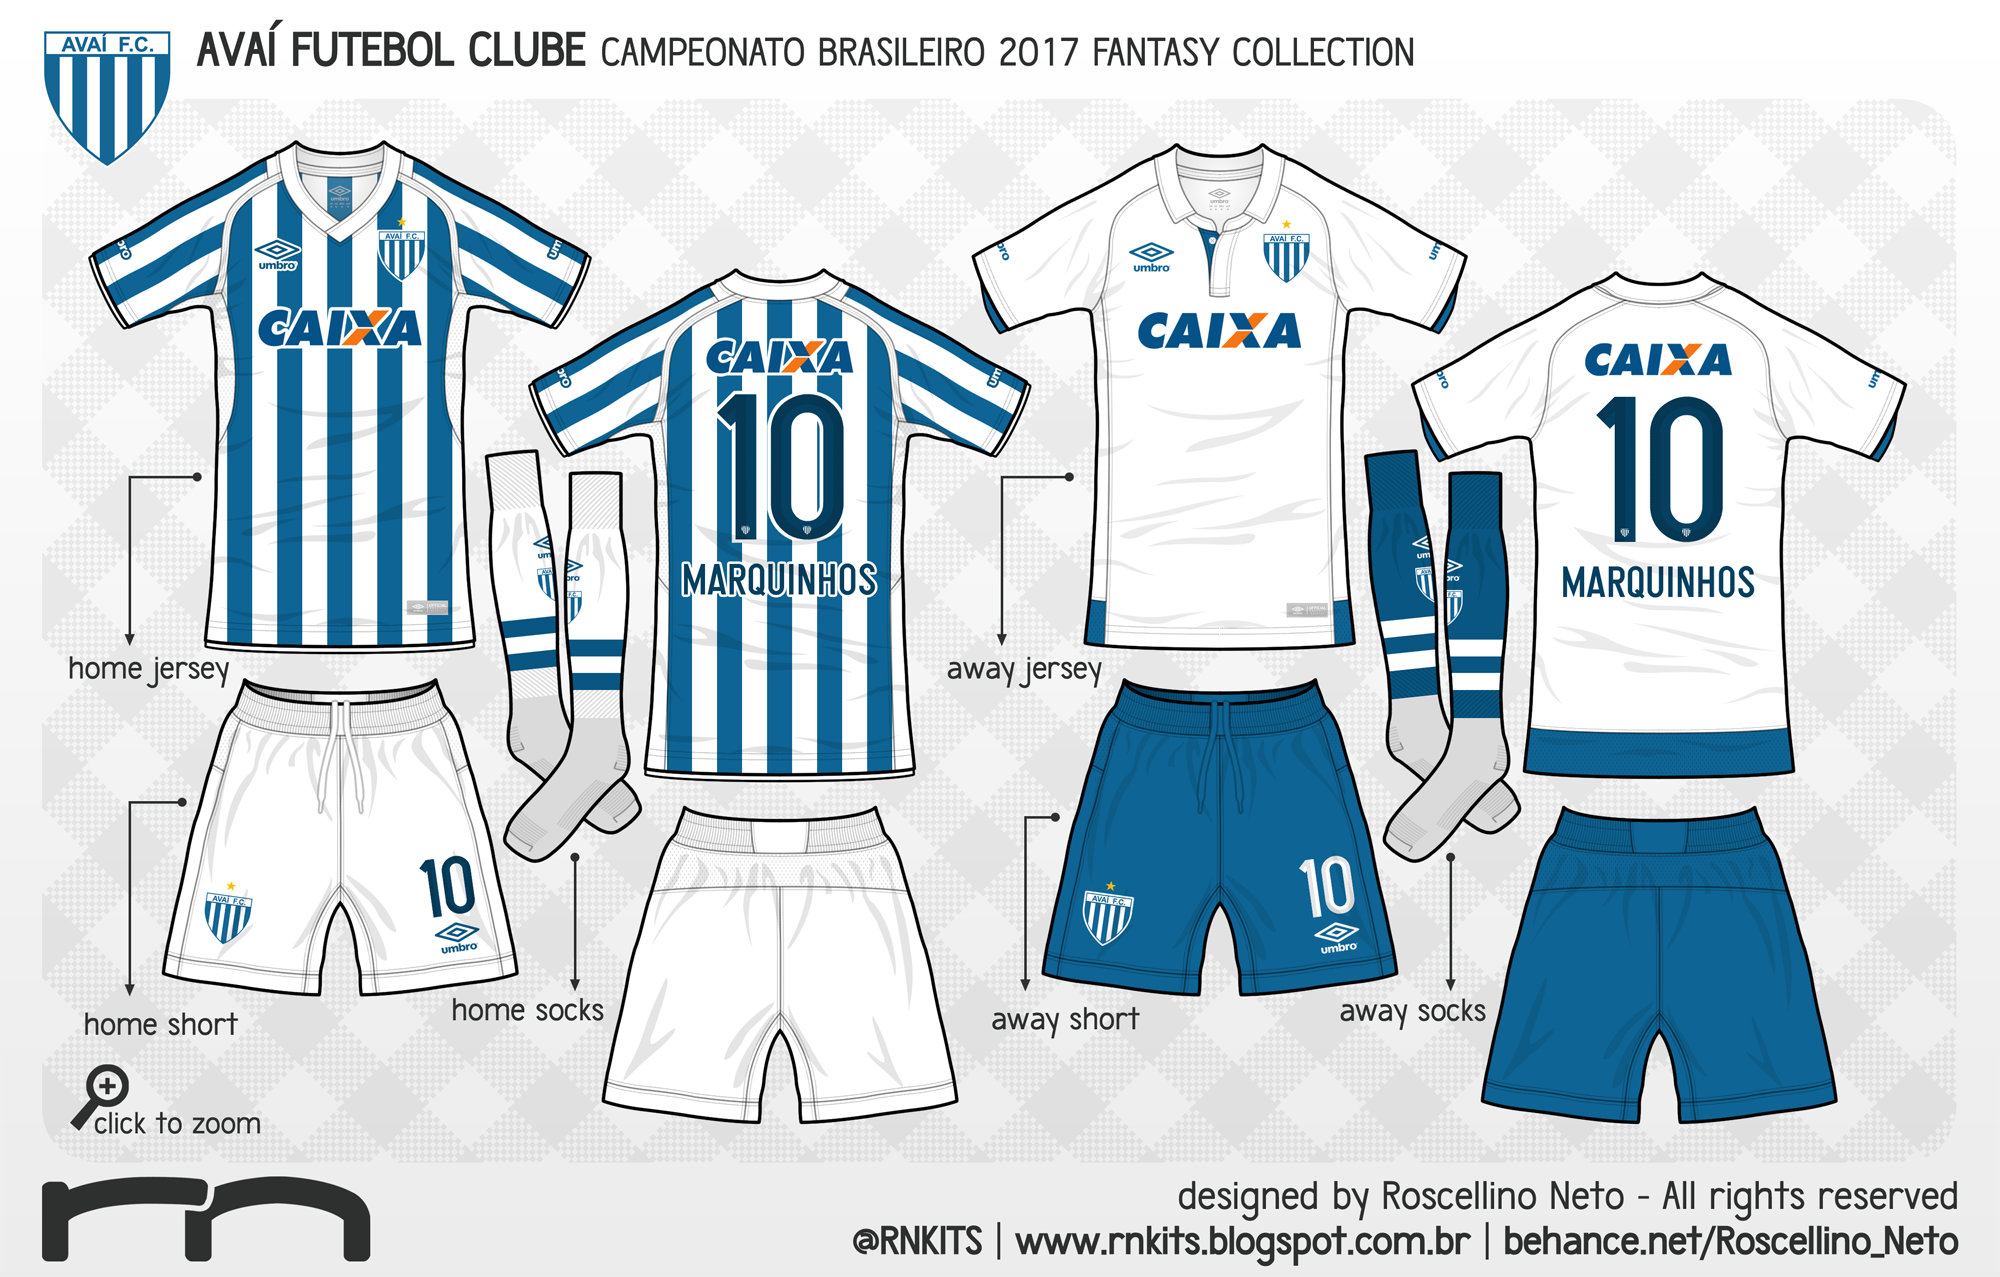 b1b66a1b36046 RN Kits  Projeto Campeonato Brasileiro 2017